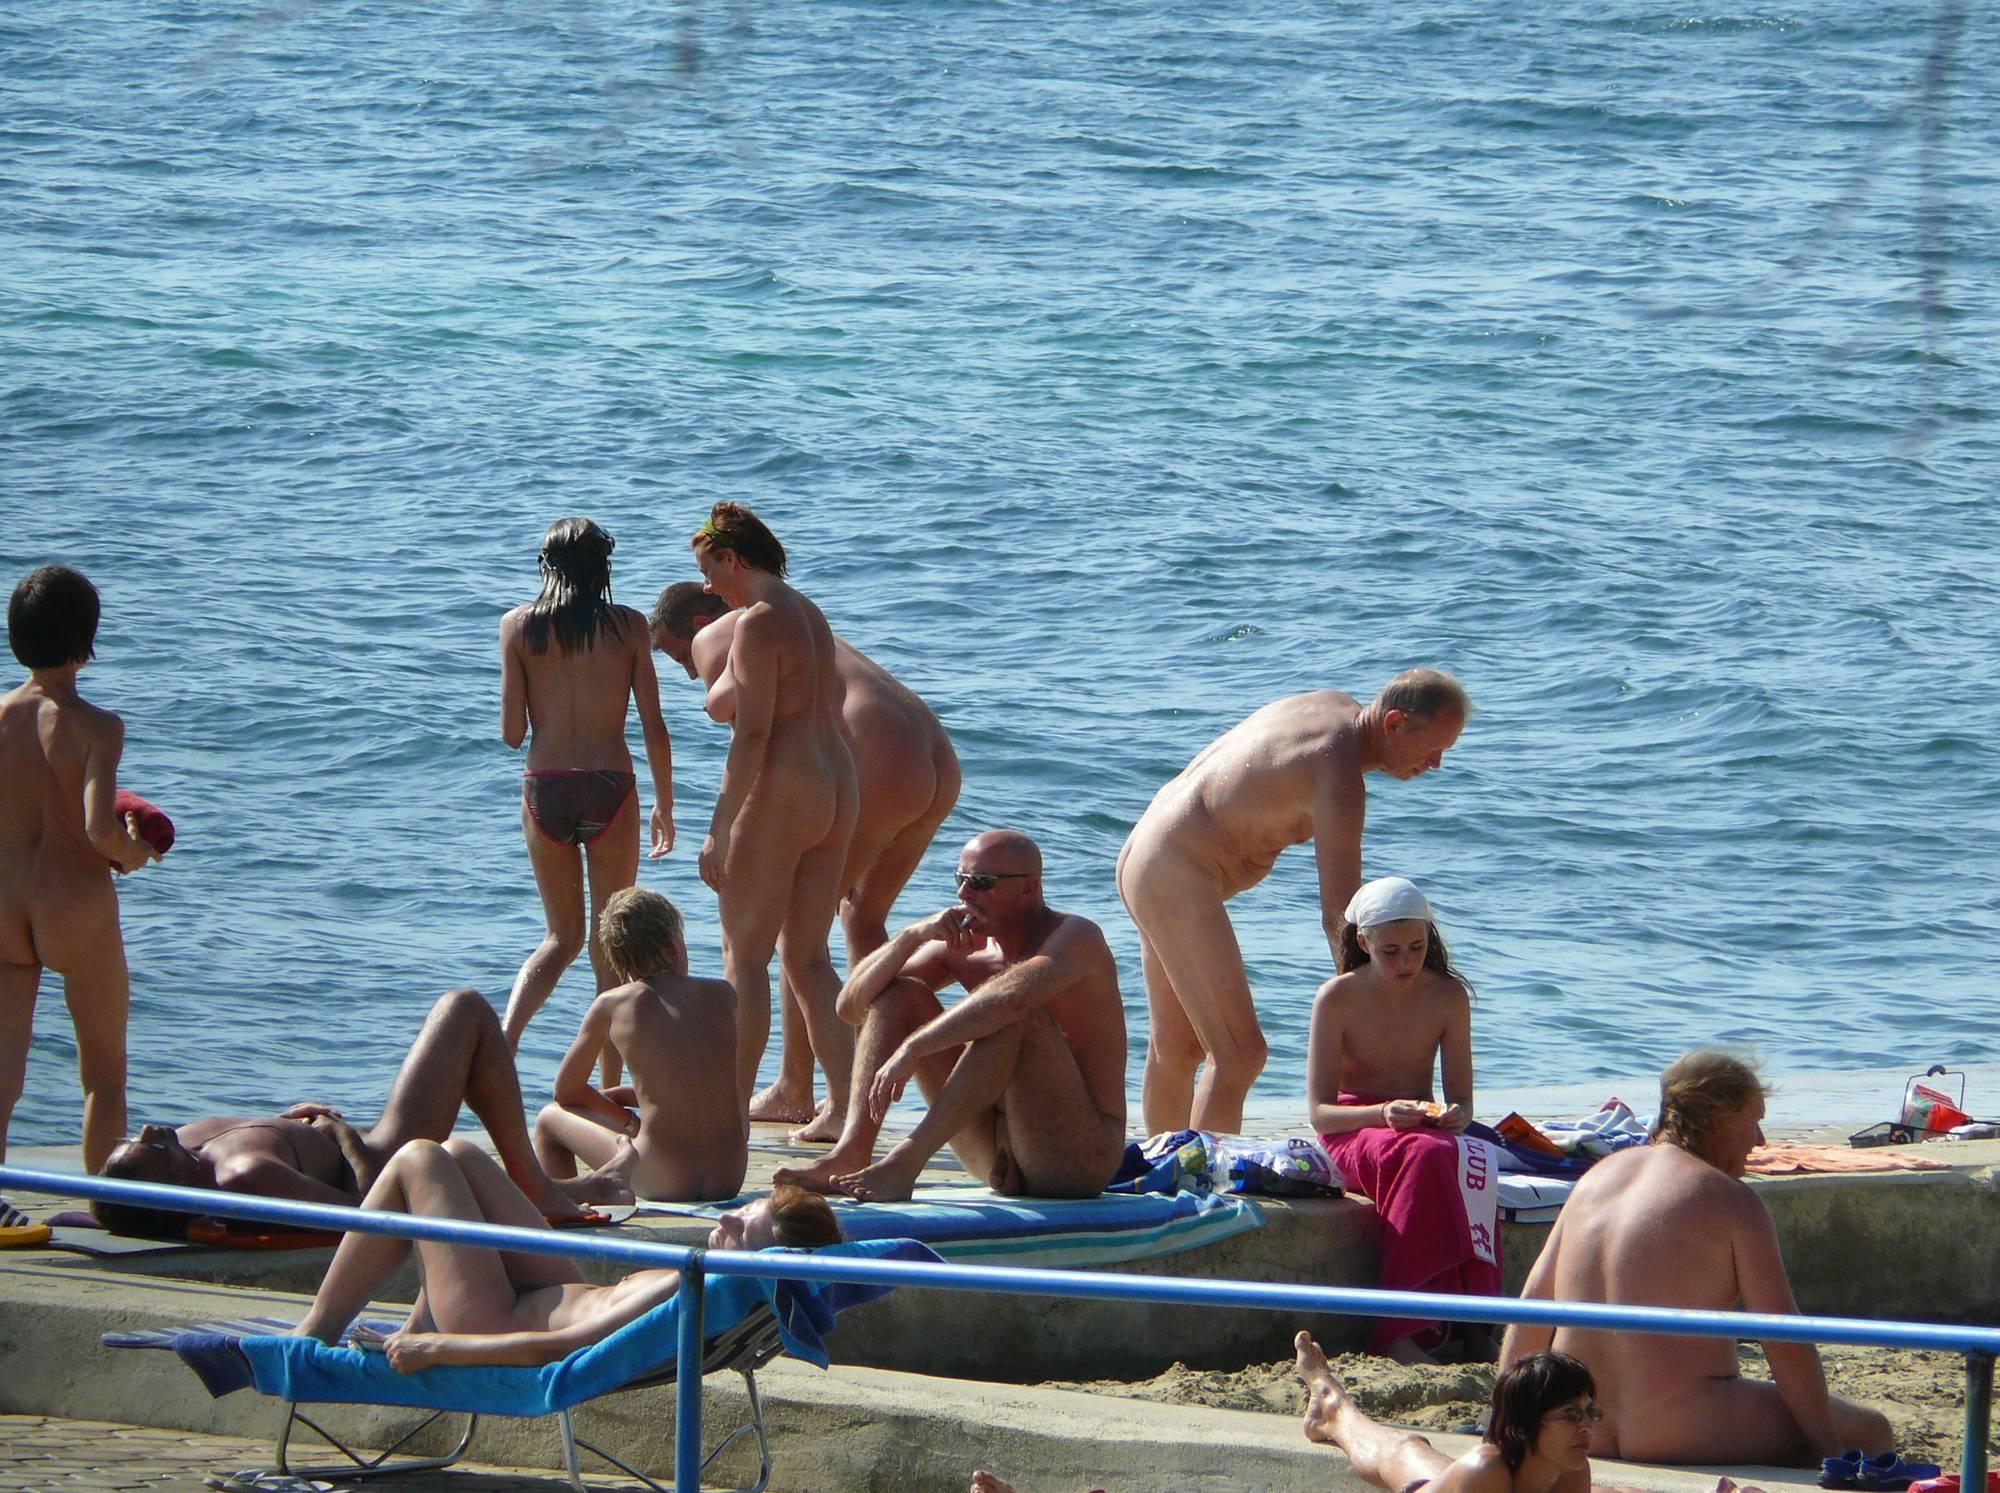 Nudist Photos Sunnyside Group Shower - 1